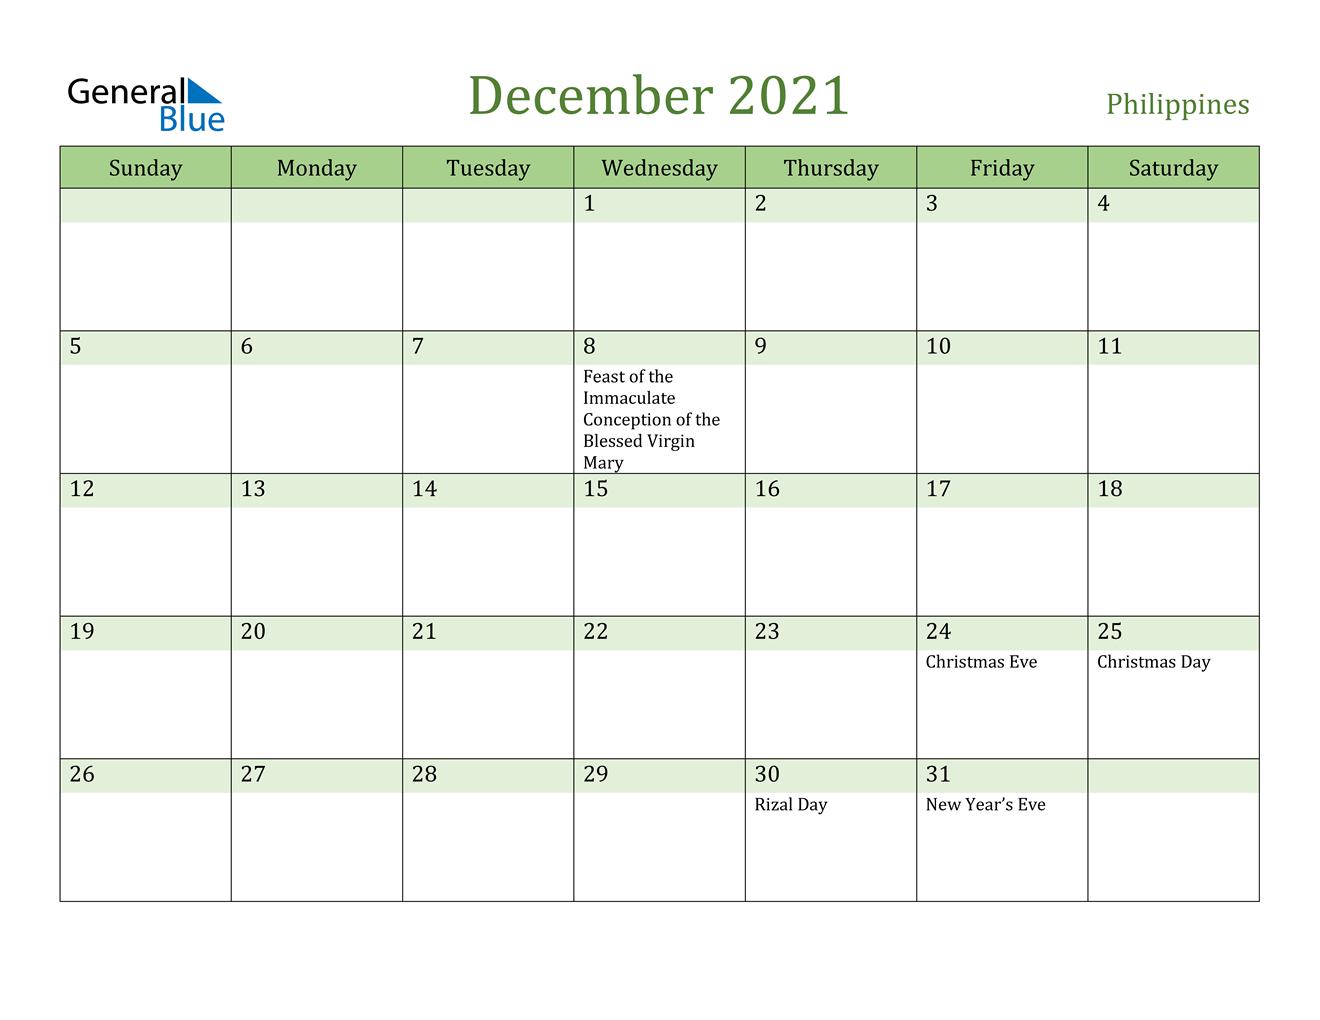 December 2021 Calendar - Philippines